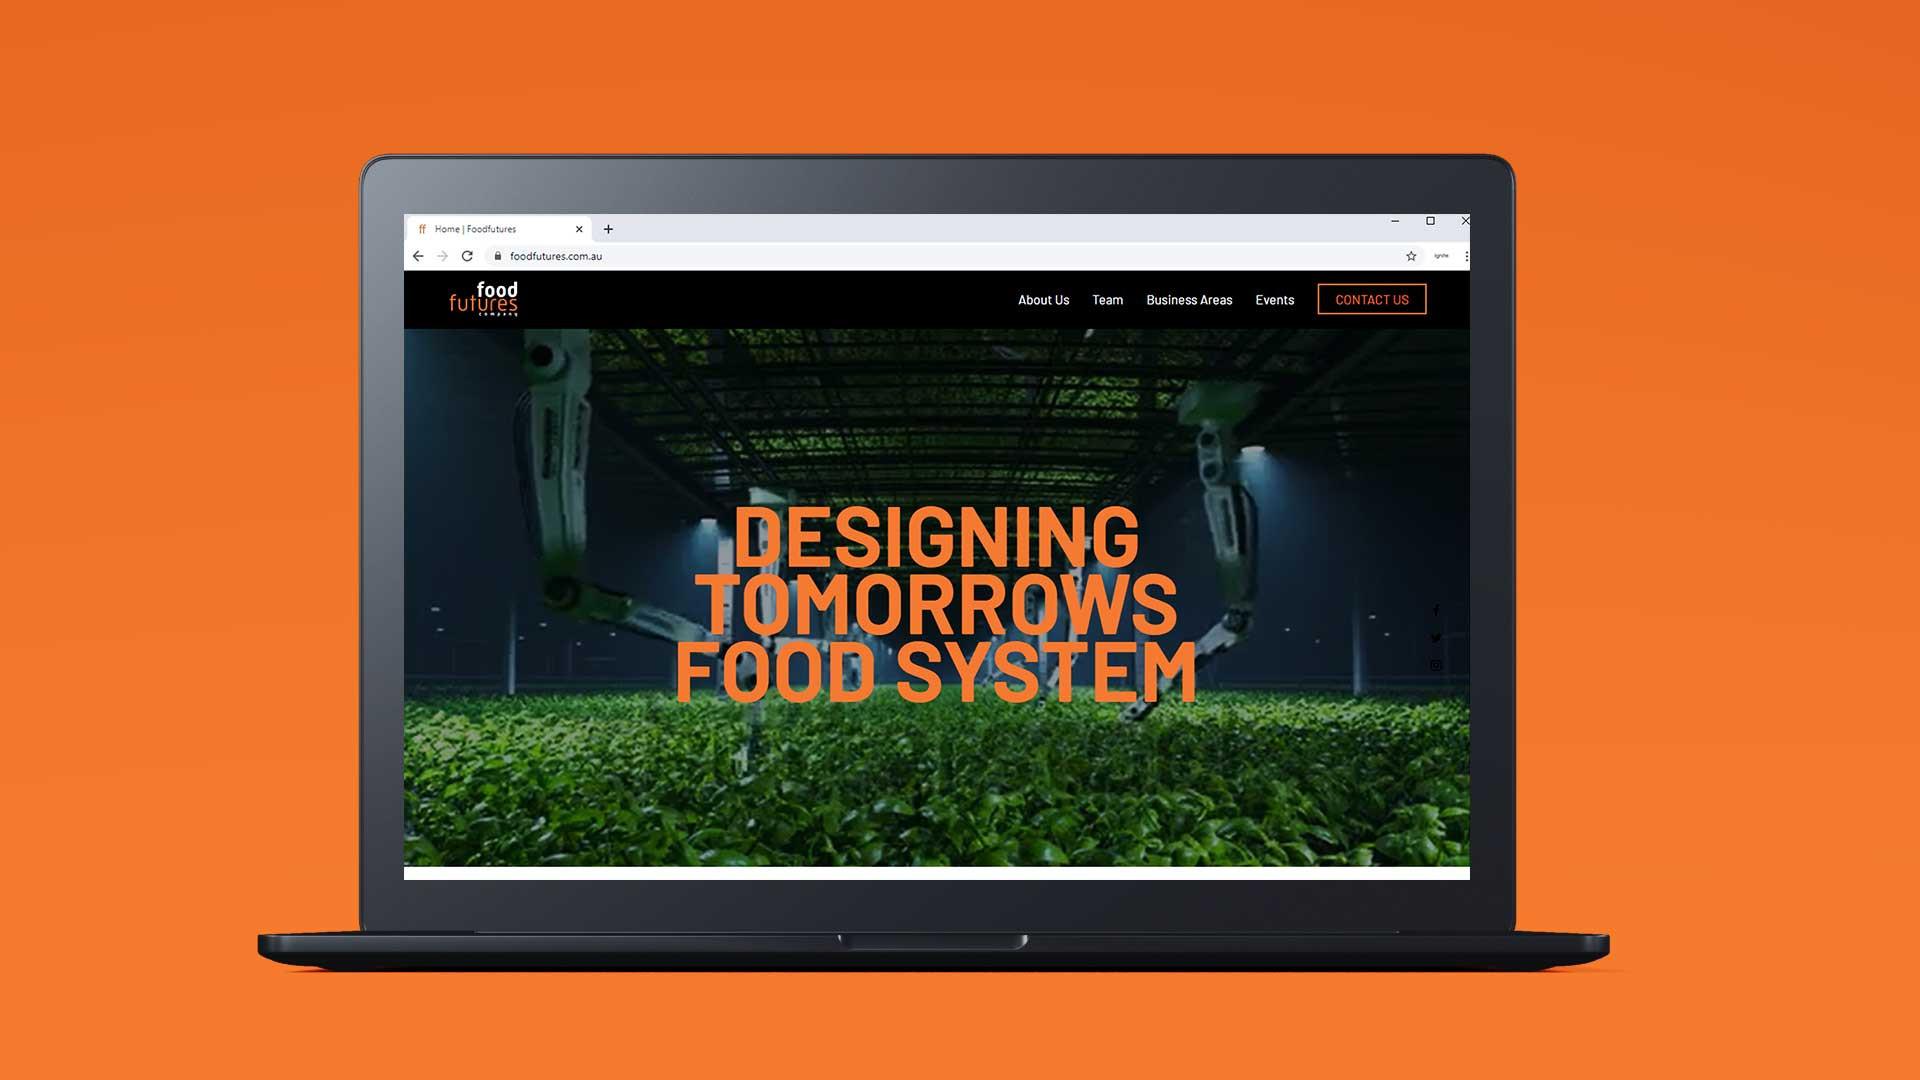 Food-futures-website.jpg